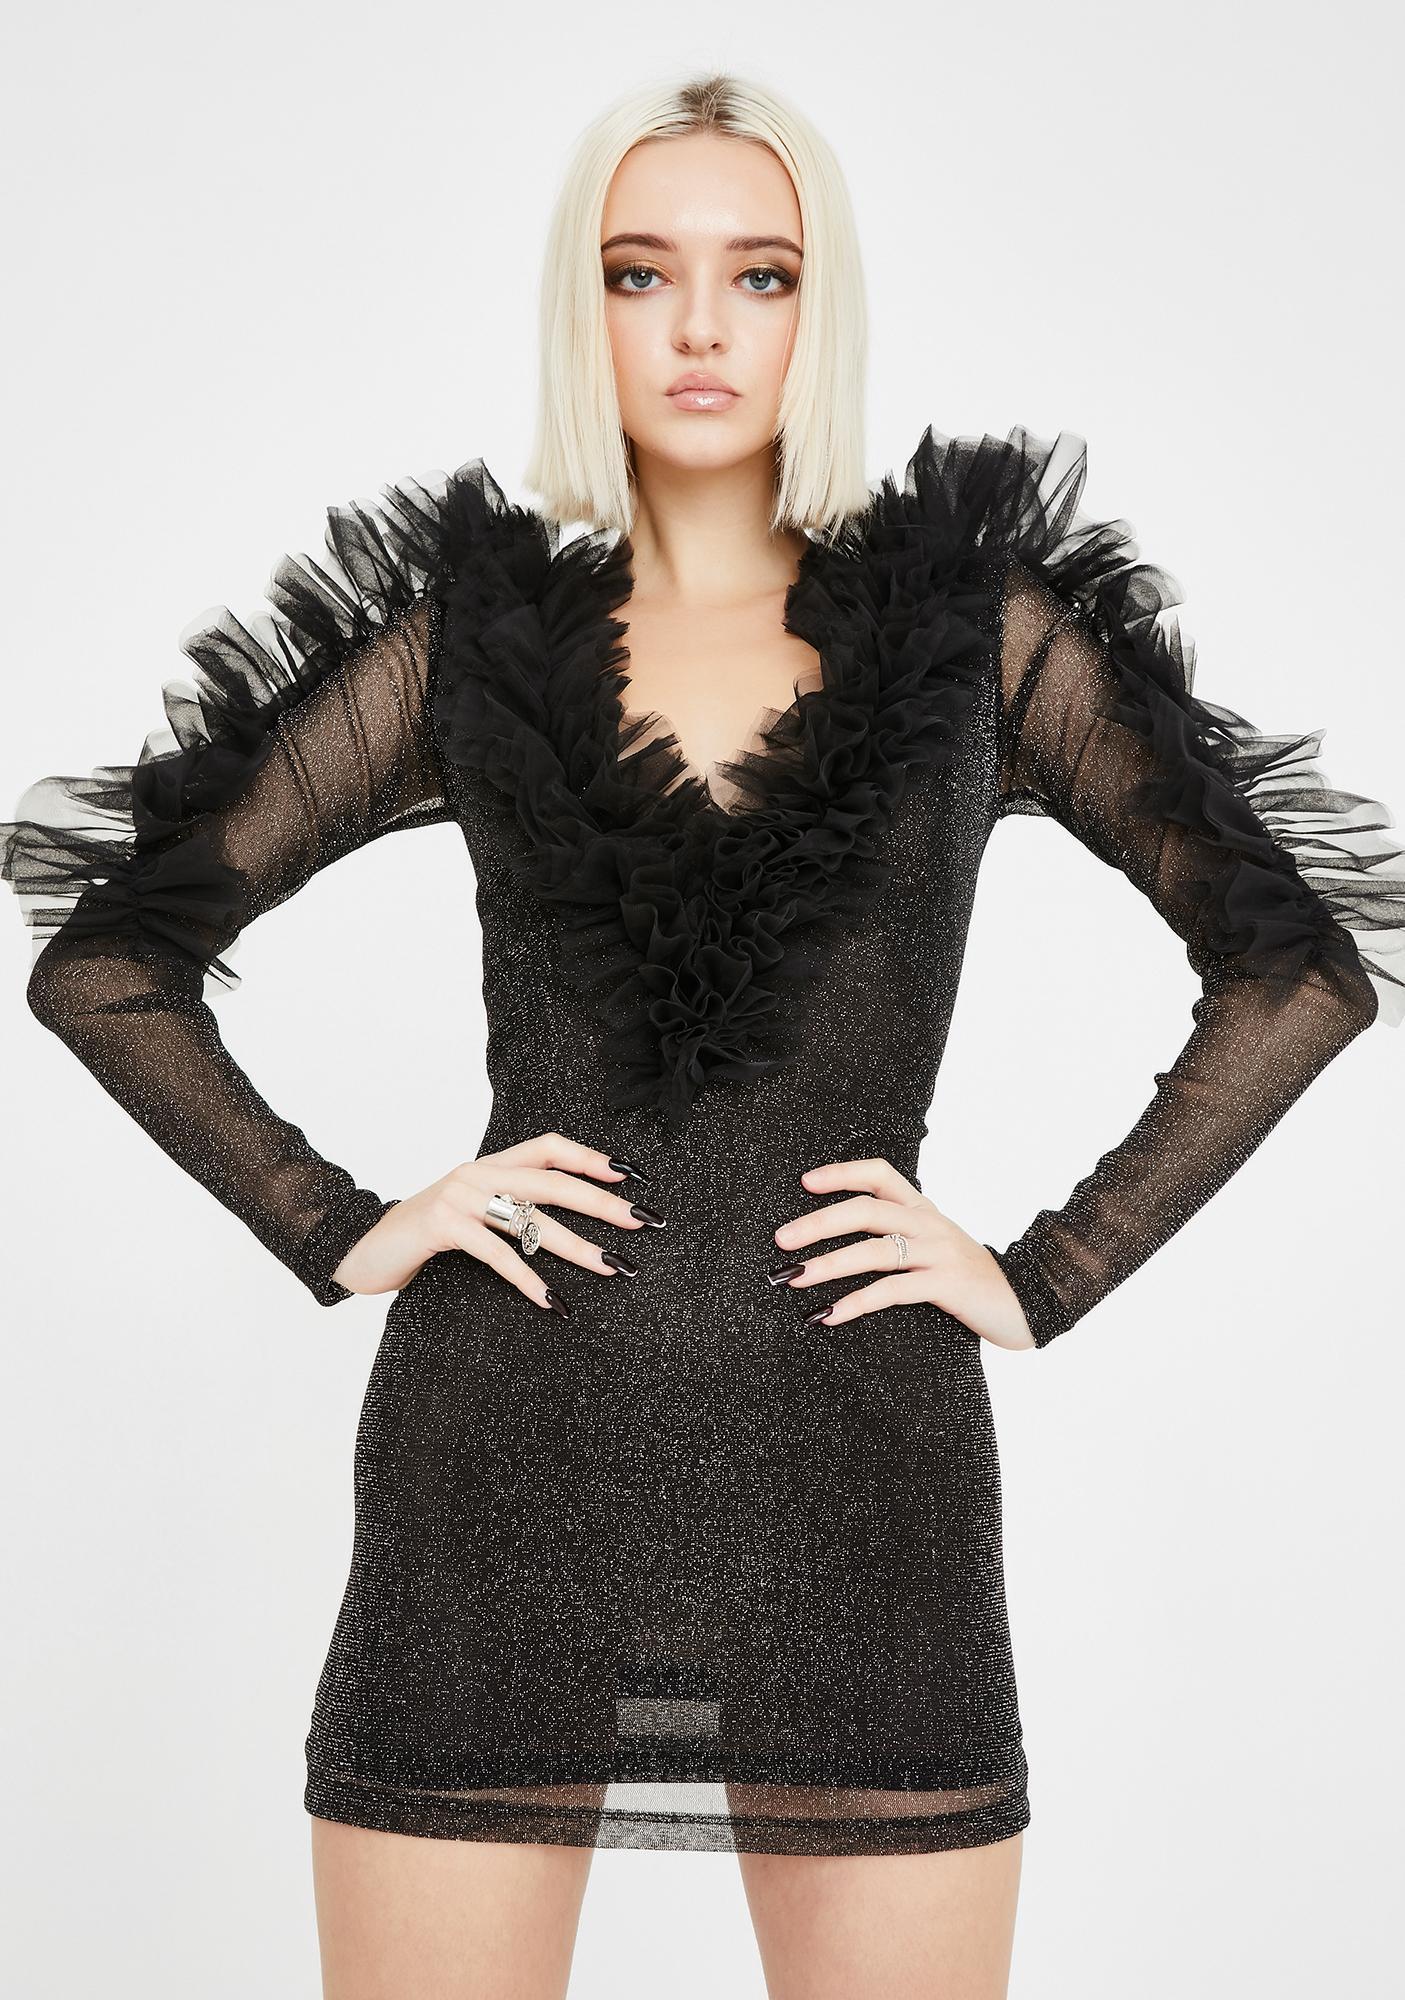 Kiki Riki Self Made Woman Mini Dress